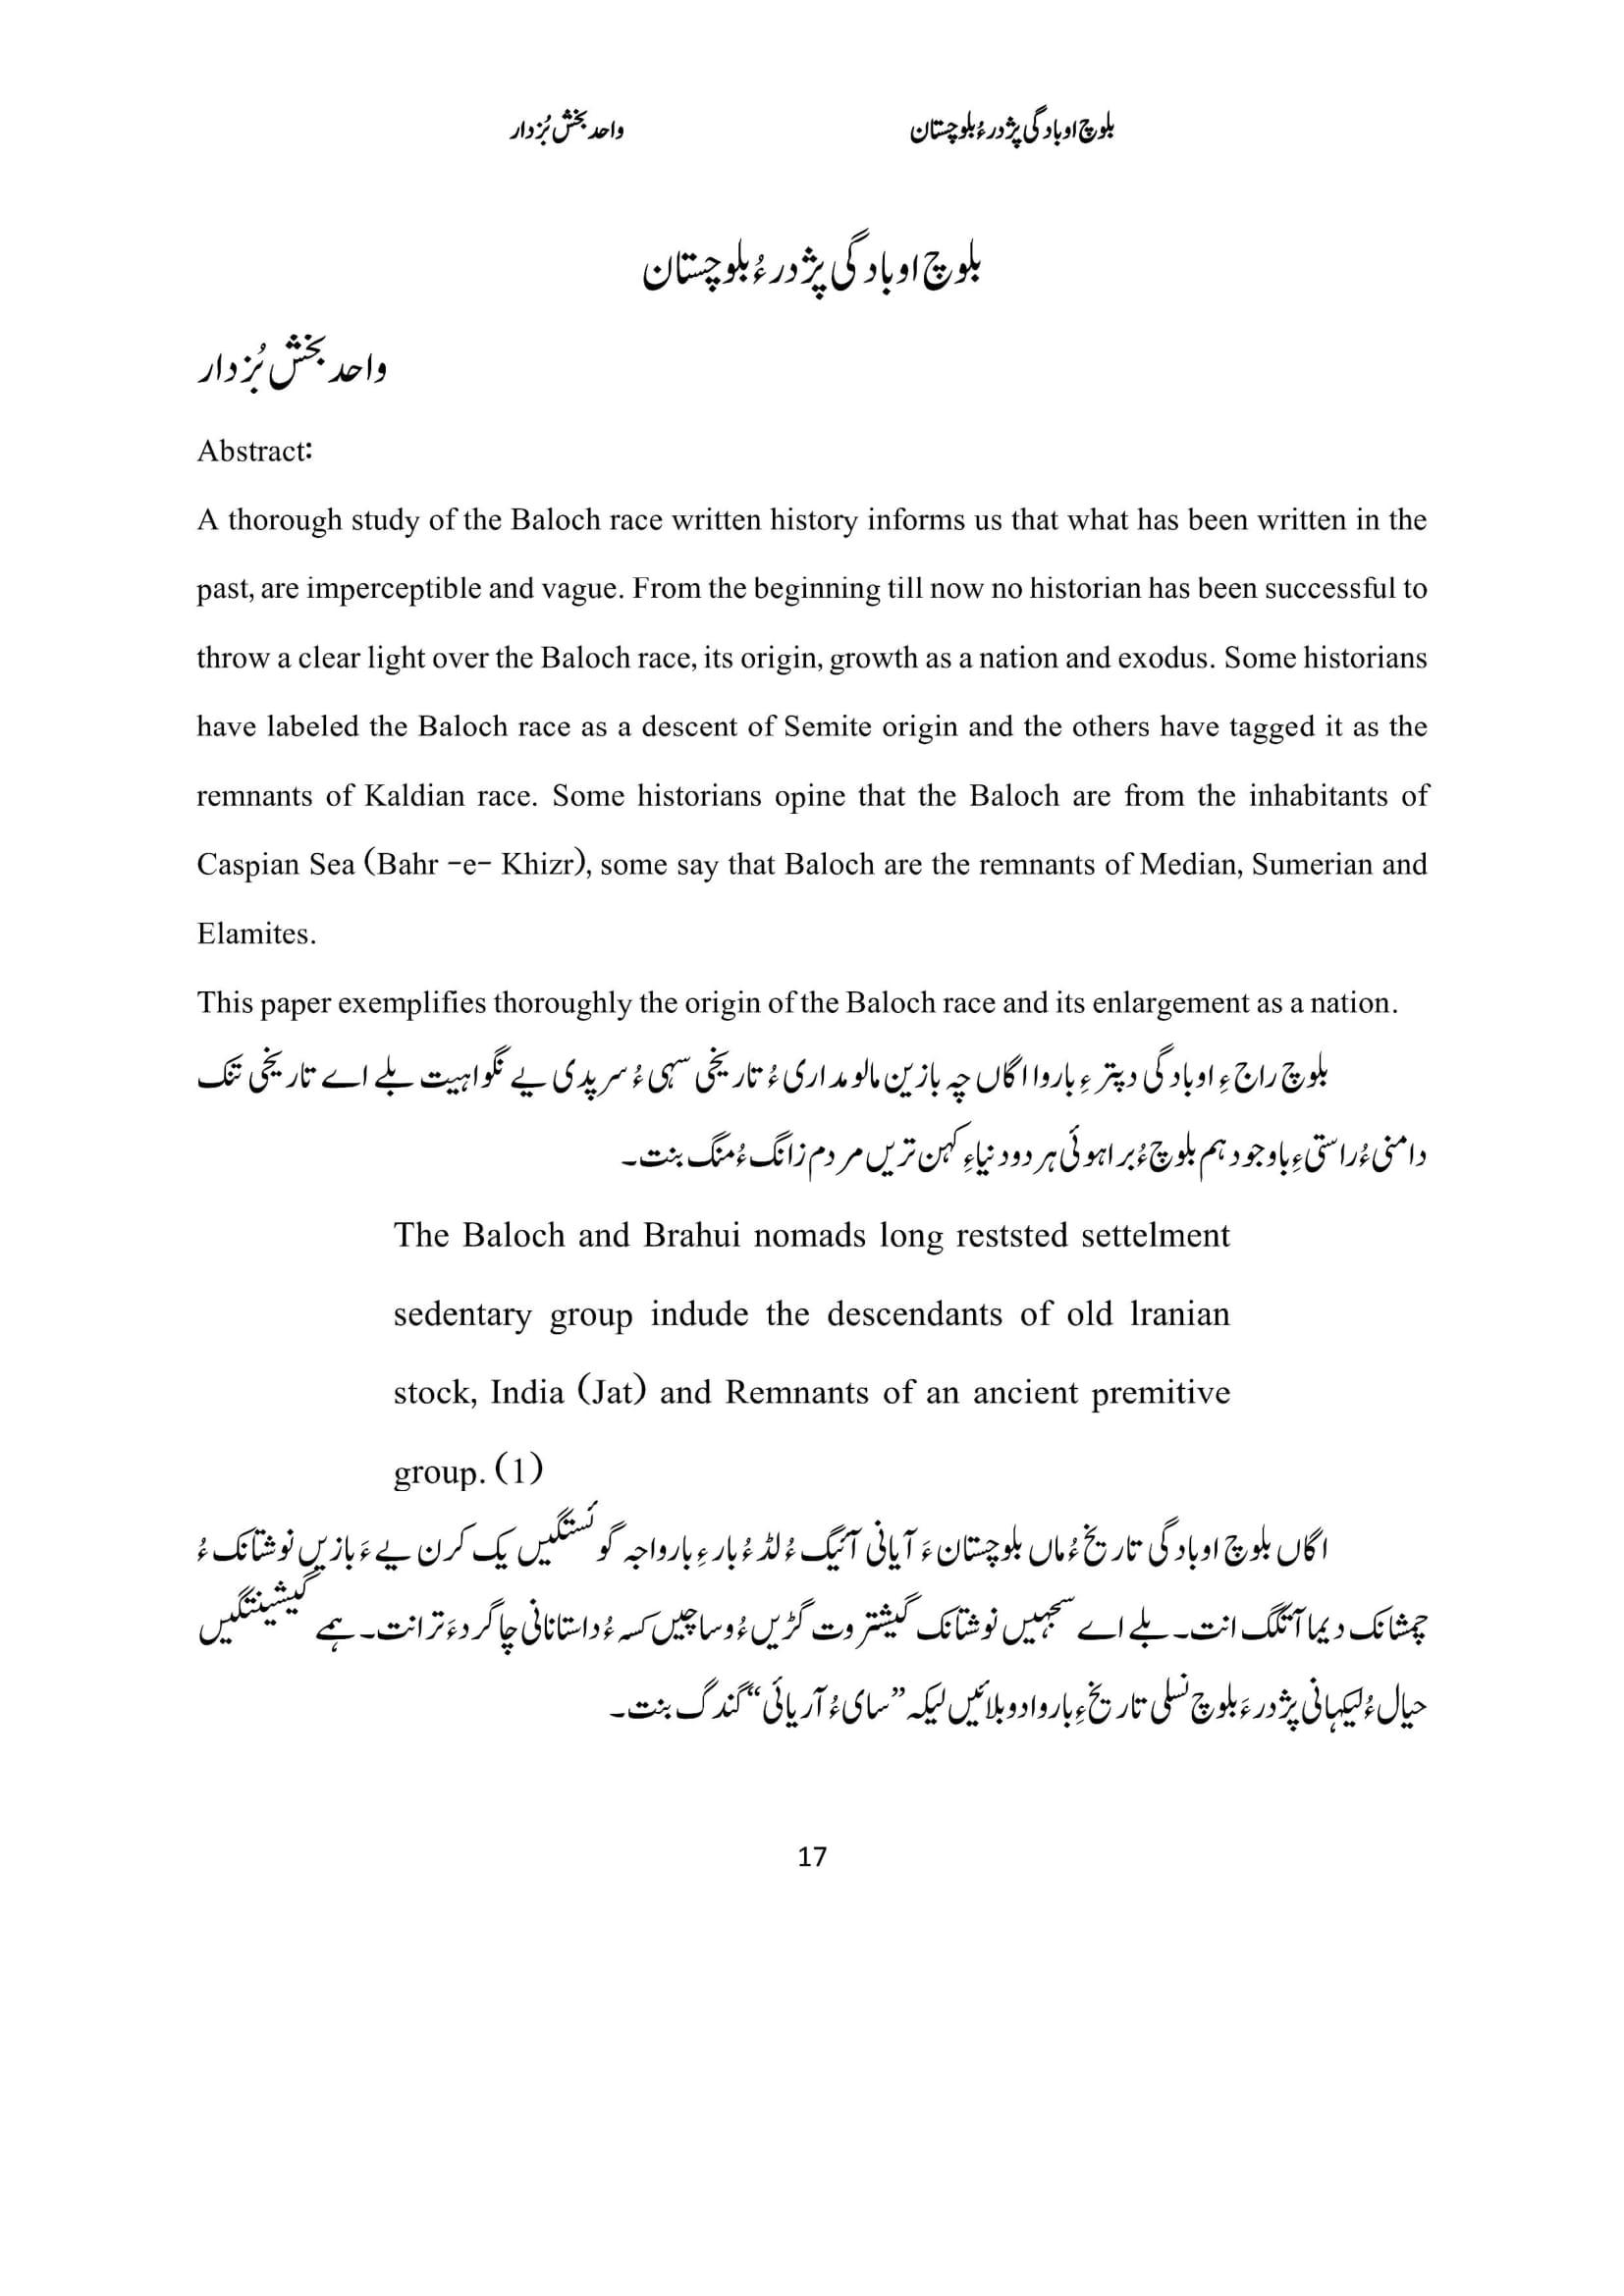 بلوچ اوبادگی پژدر ءُ بلوچستان